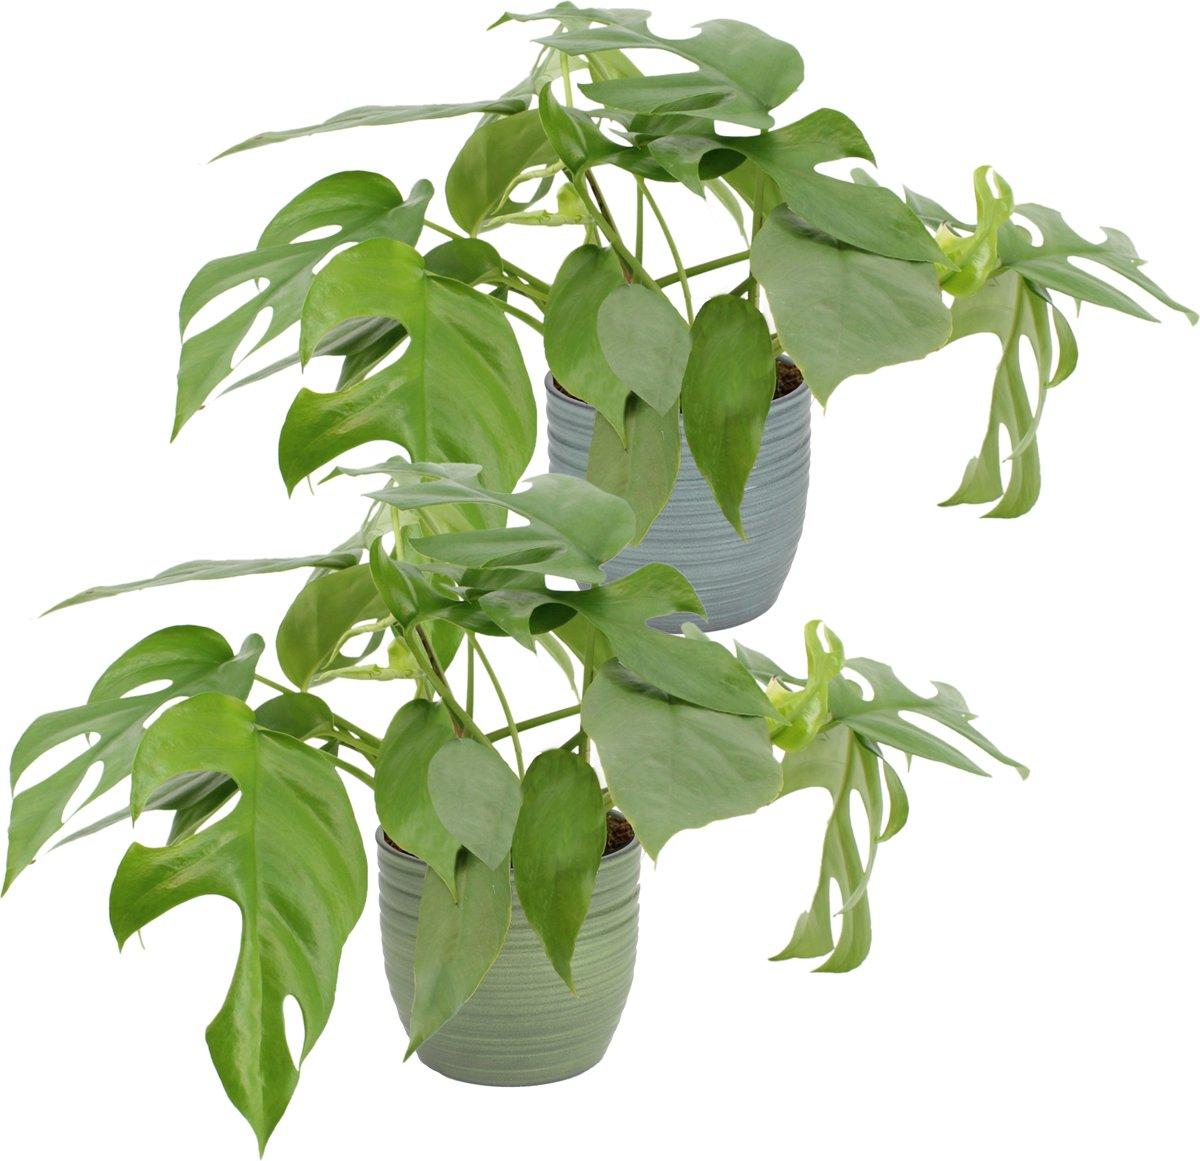 Kamerplanten van Botanicly | 2 × Duo Monstera minima | Hoogte: 25 cm  | Monstera minima kopen